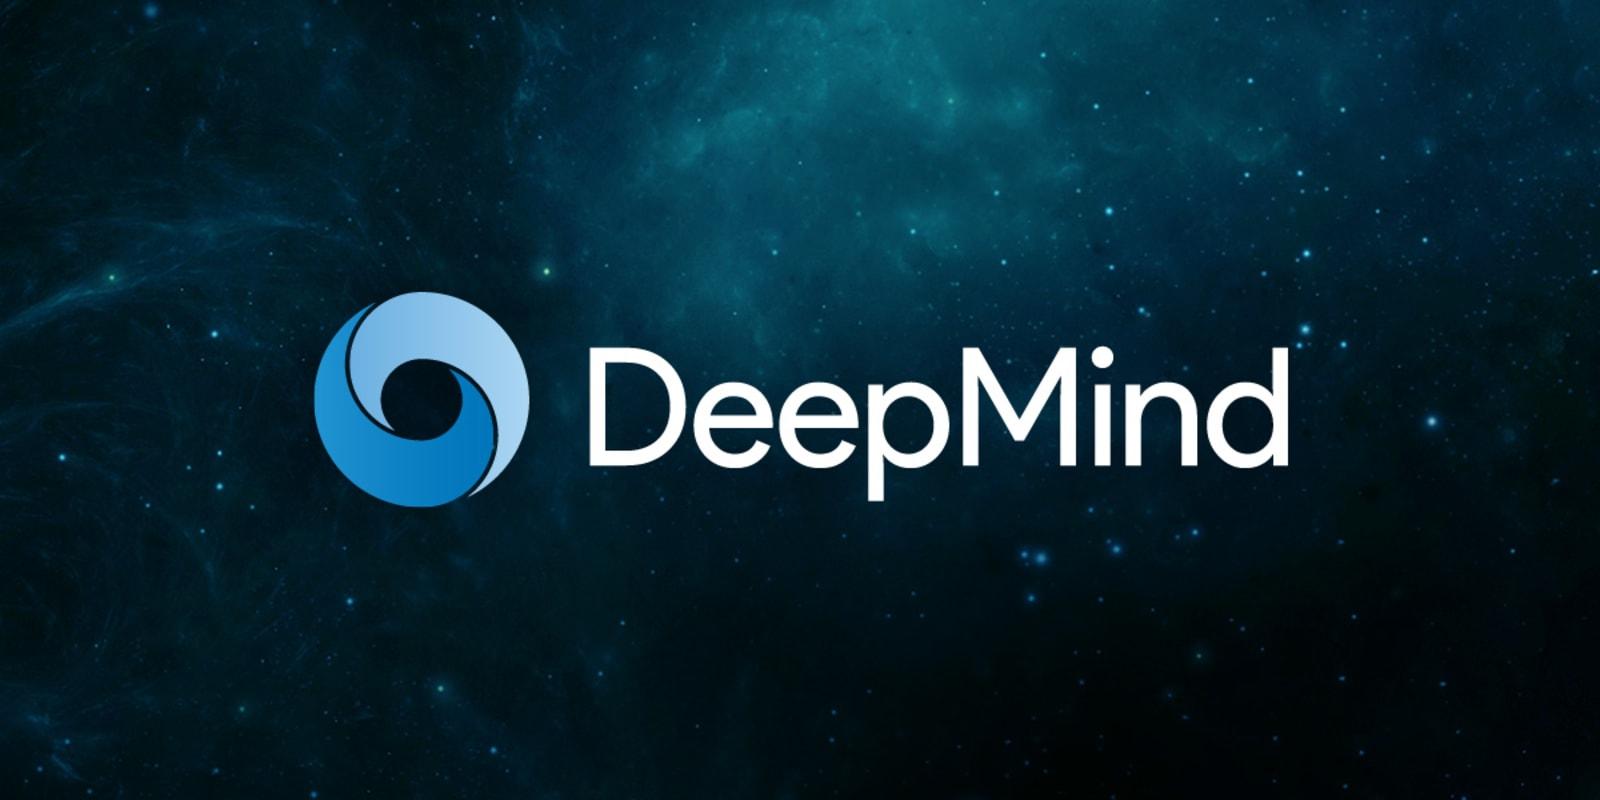 DeepMind AI AlphaStar goes 10-1 against top 'StarCraft II' pros